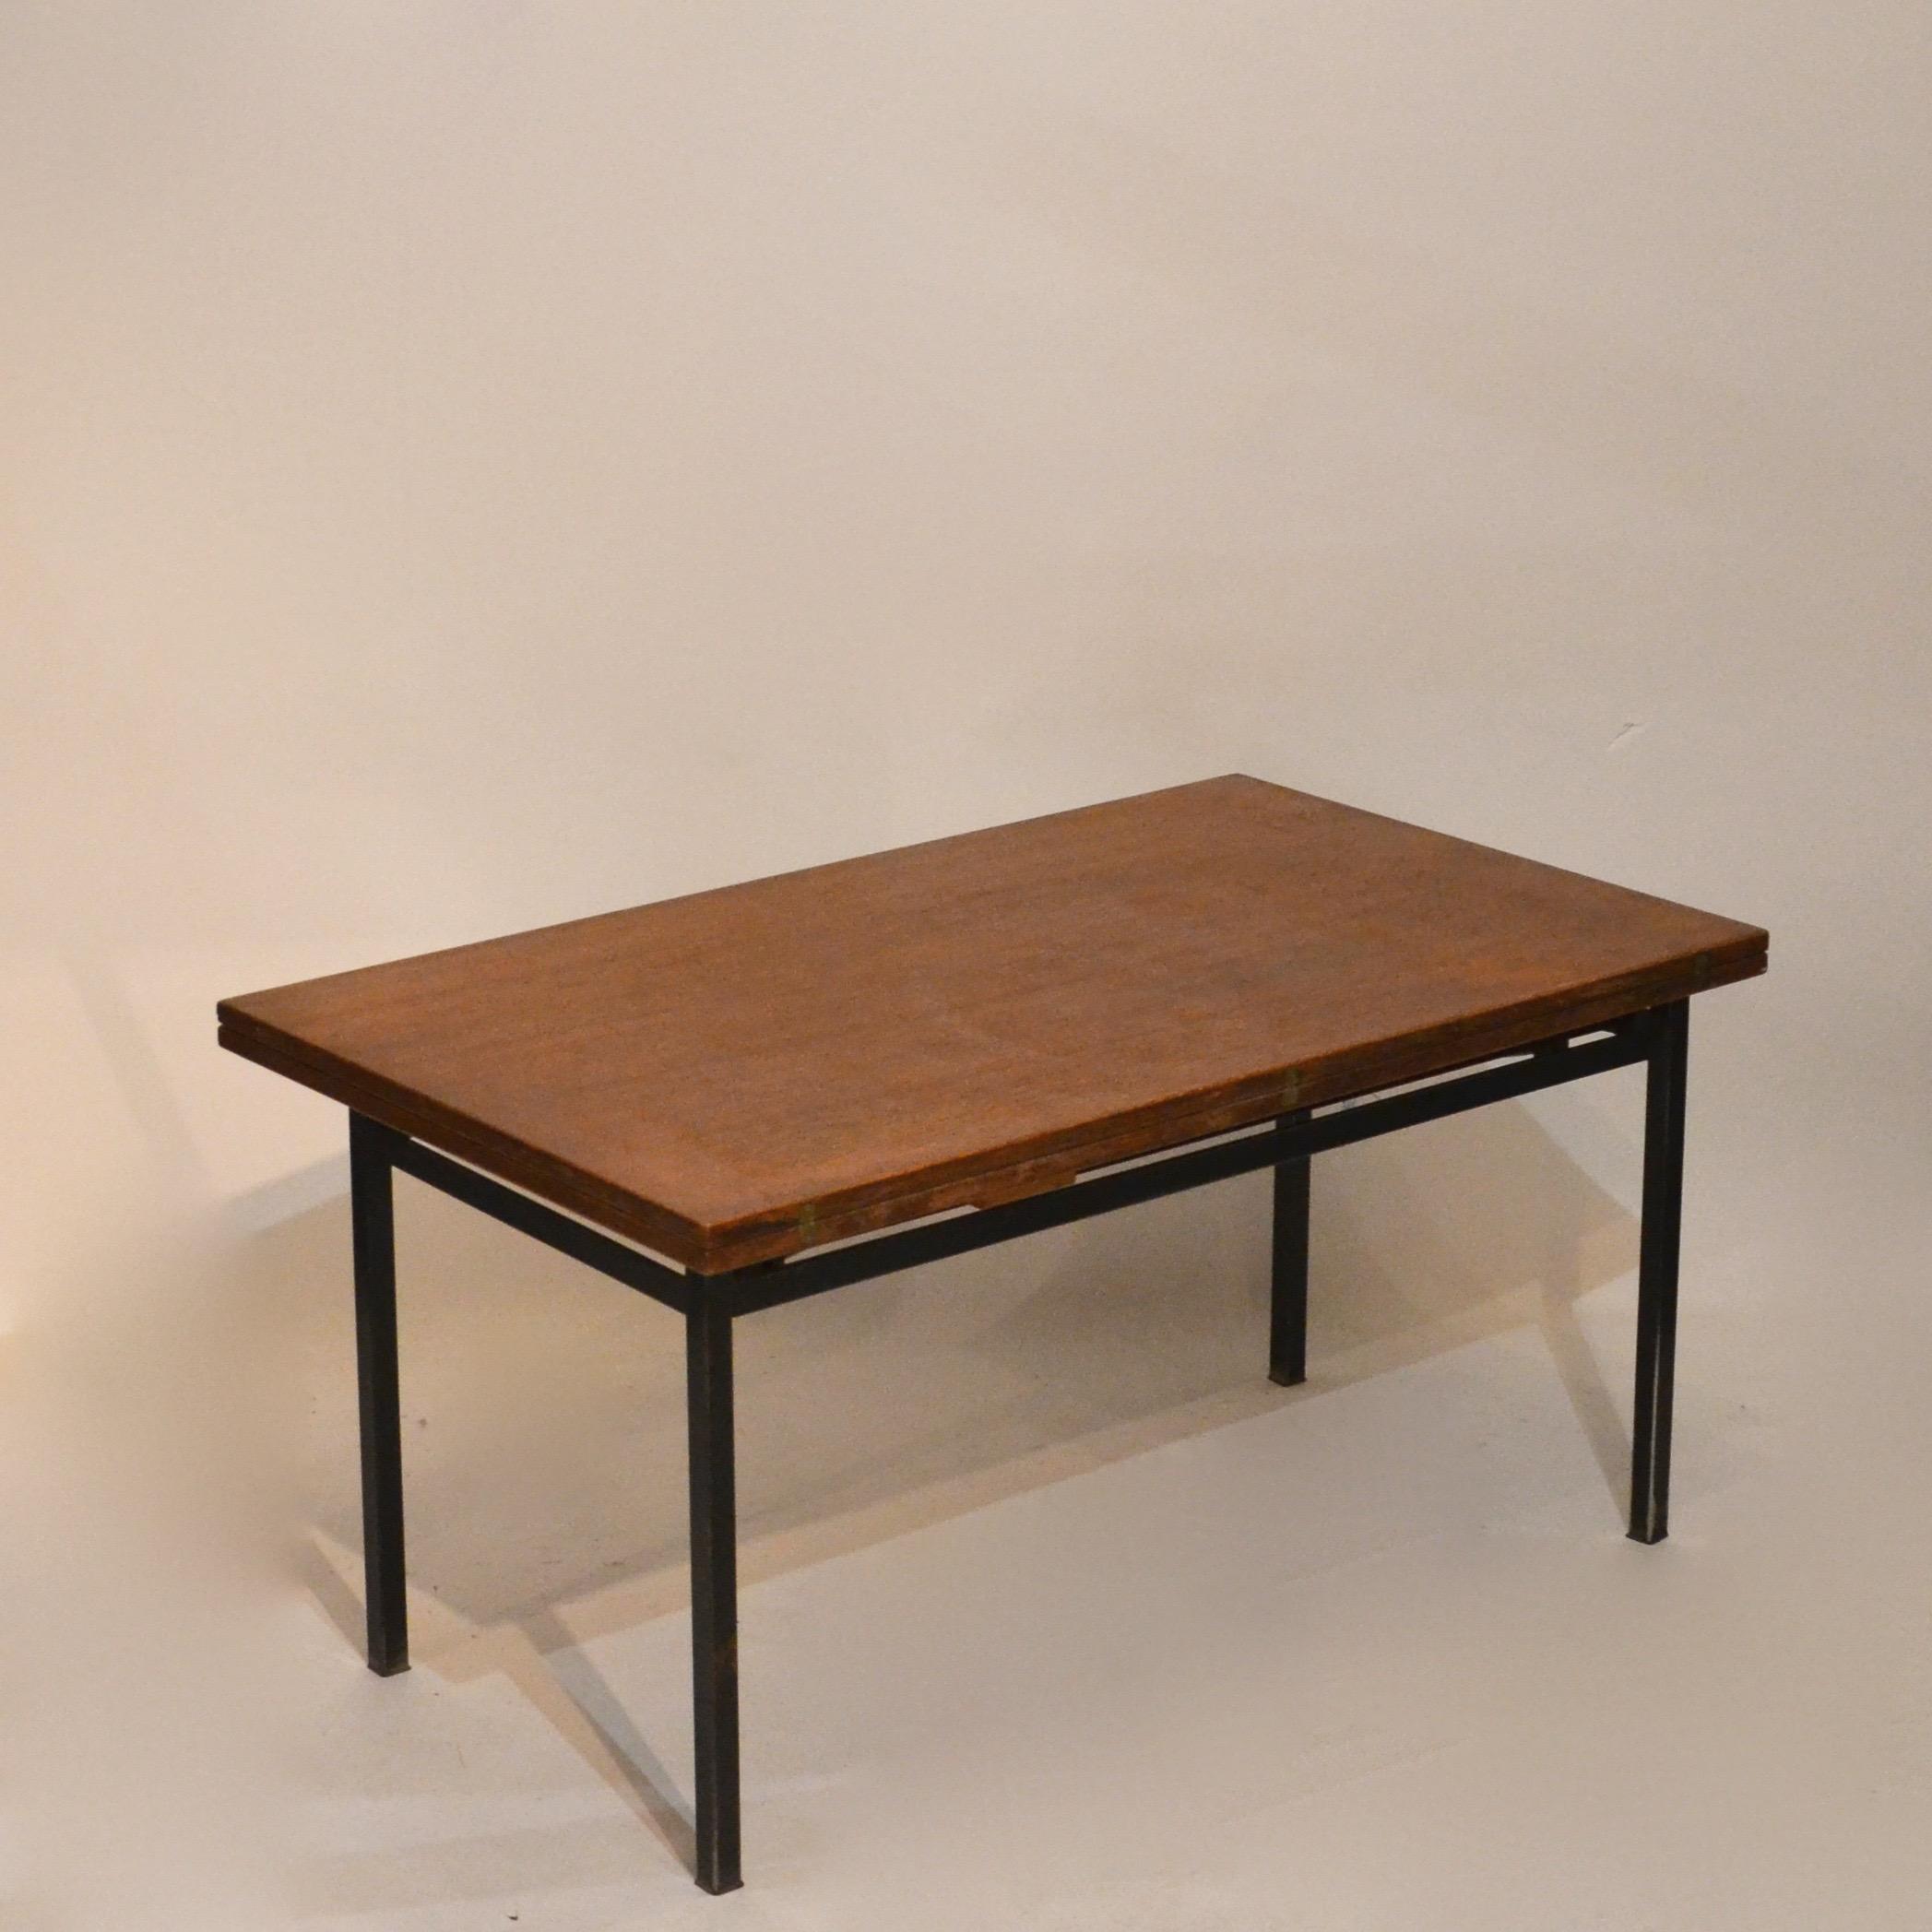 table basse manger modulable bindiesbindies. Black Bedroom Furniture Sets. Home Design Ideas